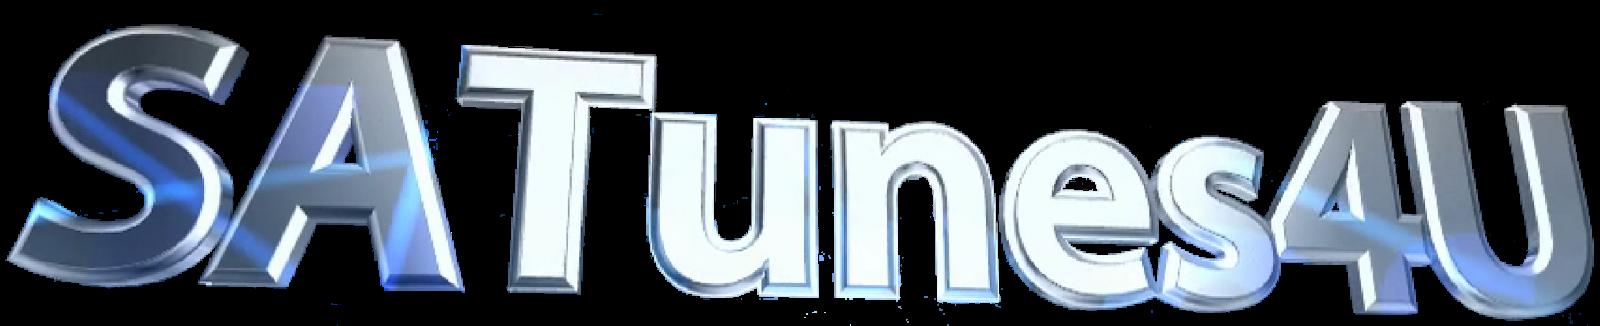 SATunes4U | Pc | Blogger tips, tricks, tutorials and widgets